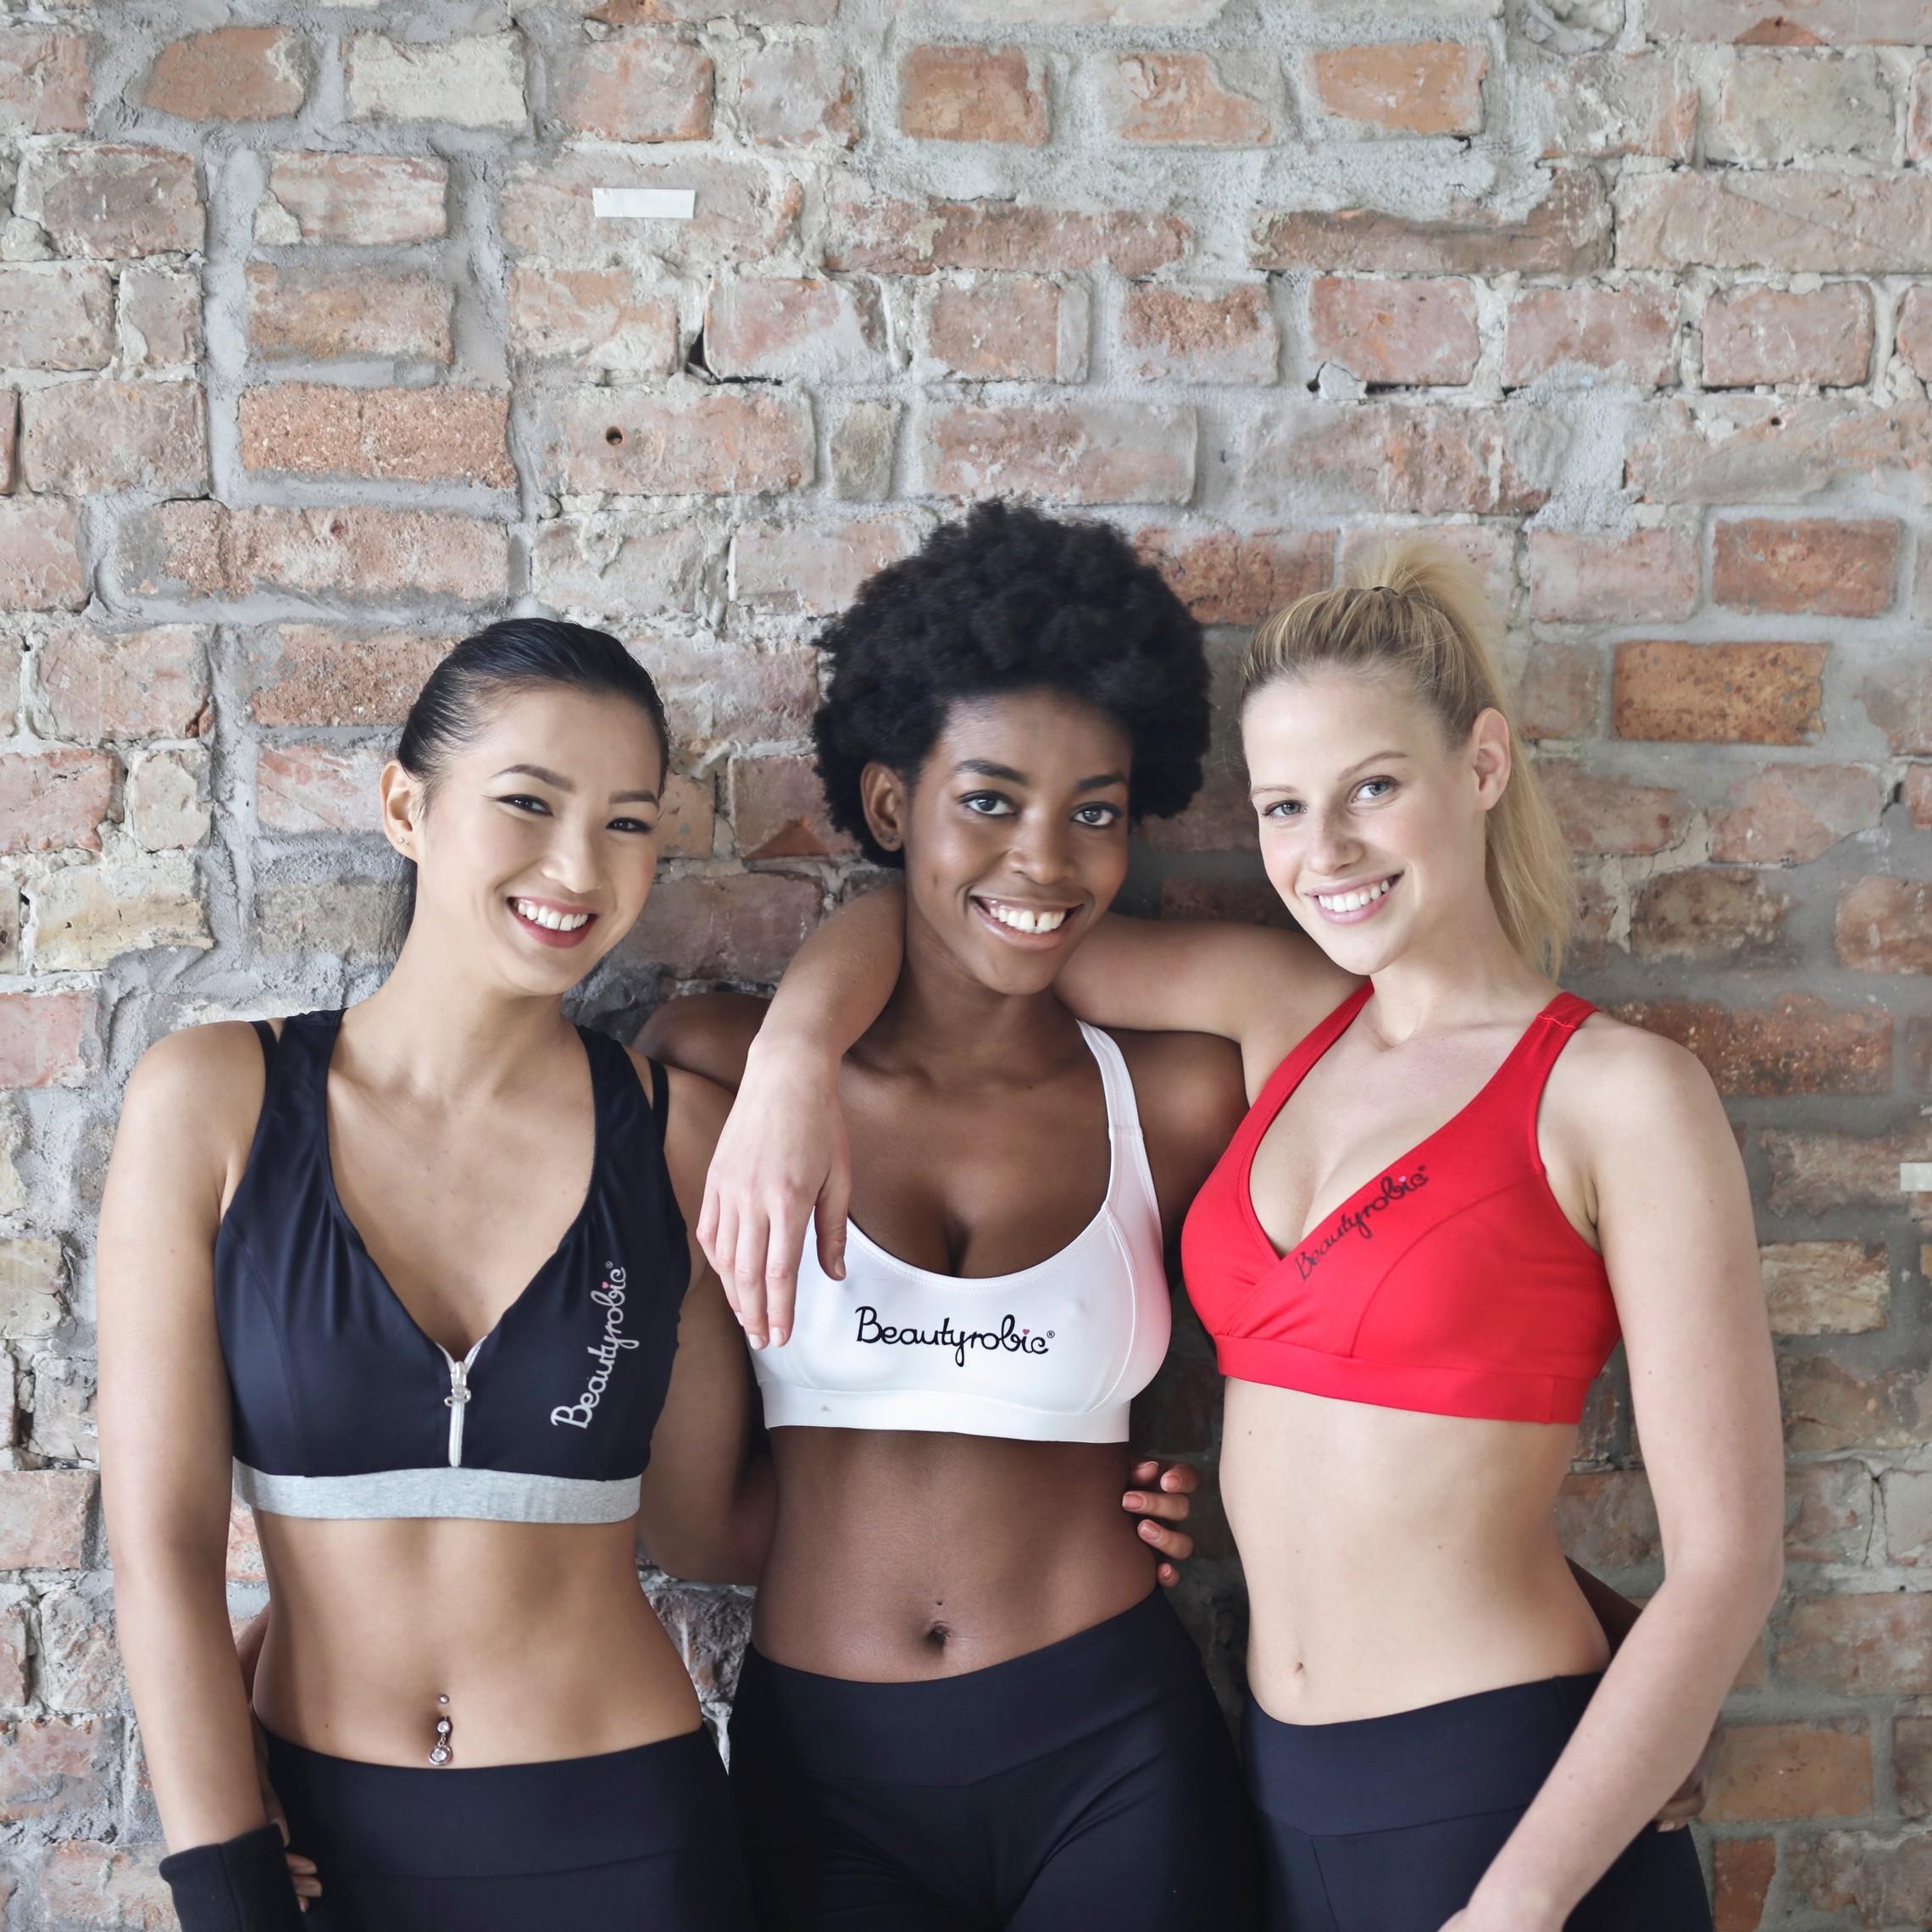 The women in active wear